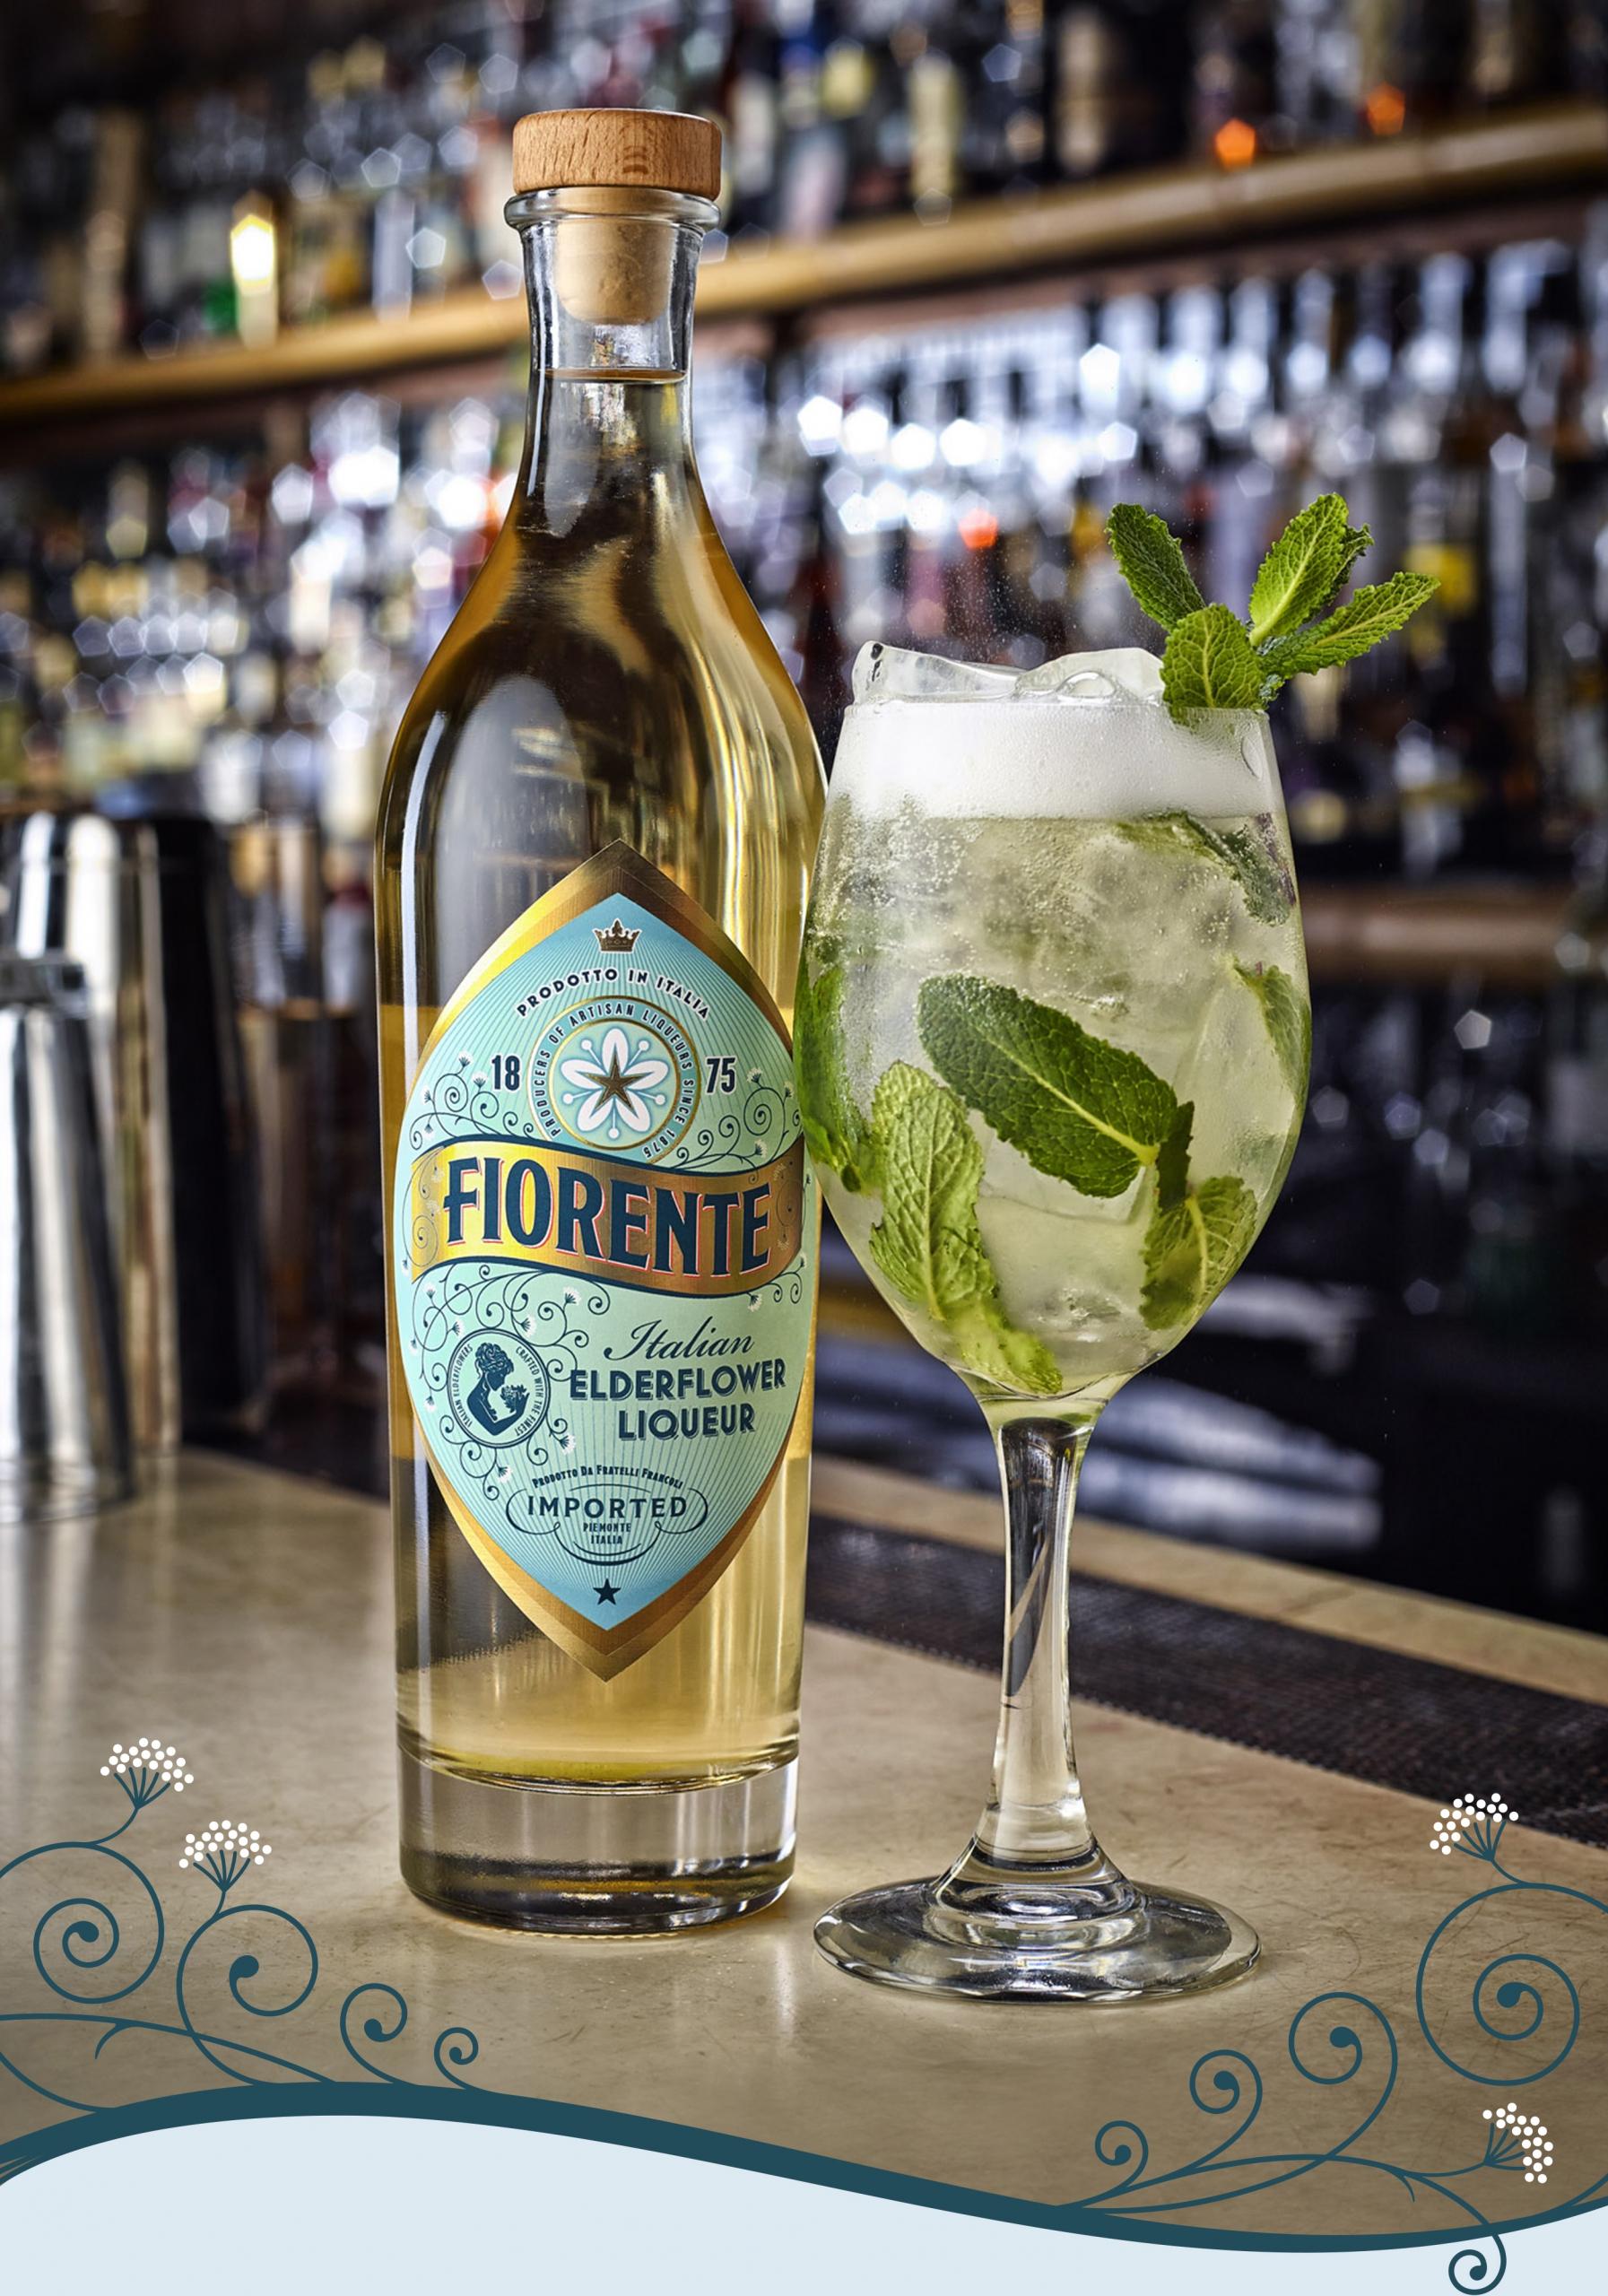 Lifestyle shot featuring bottle design for Fiorente